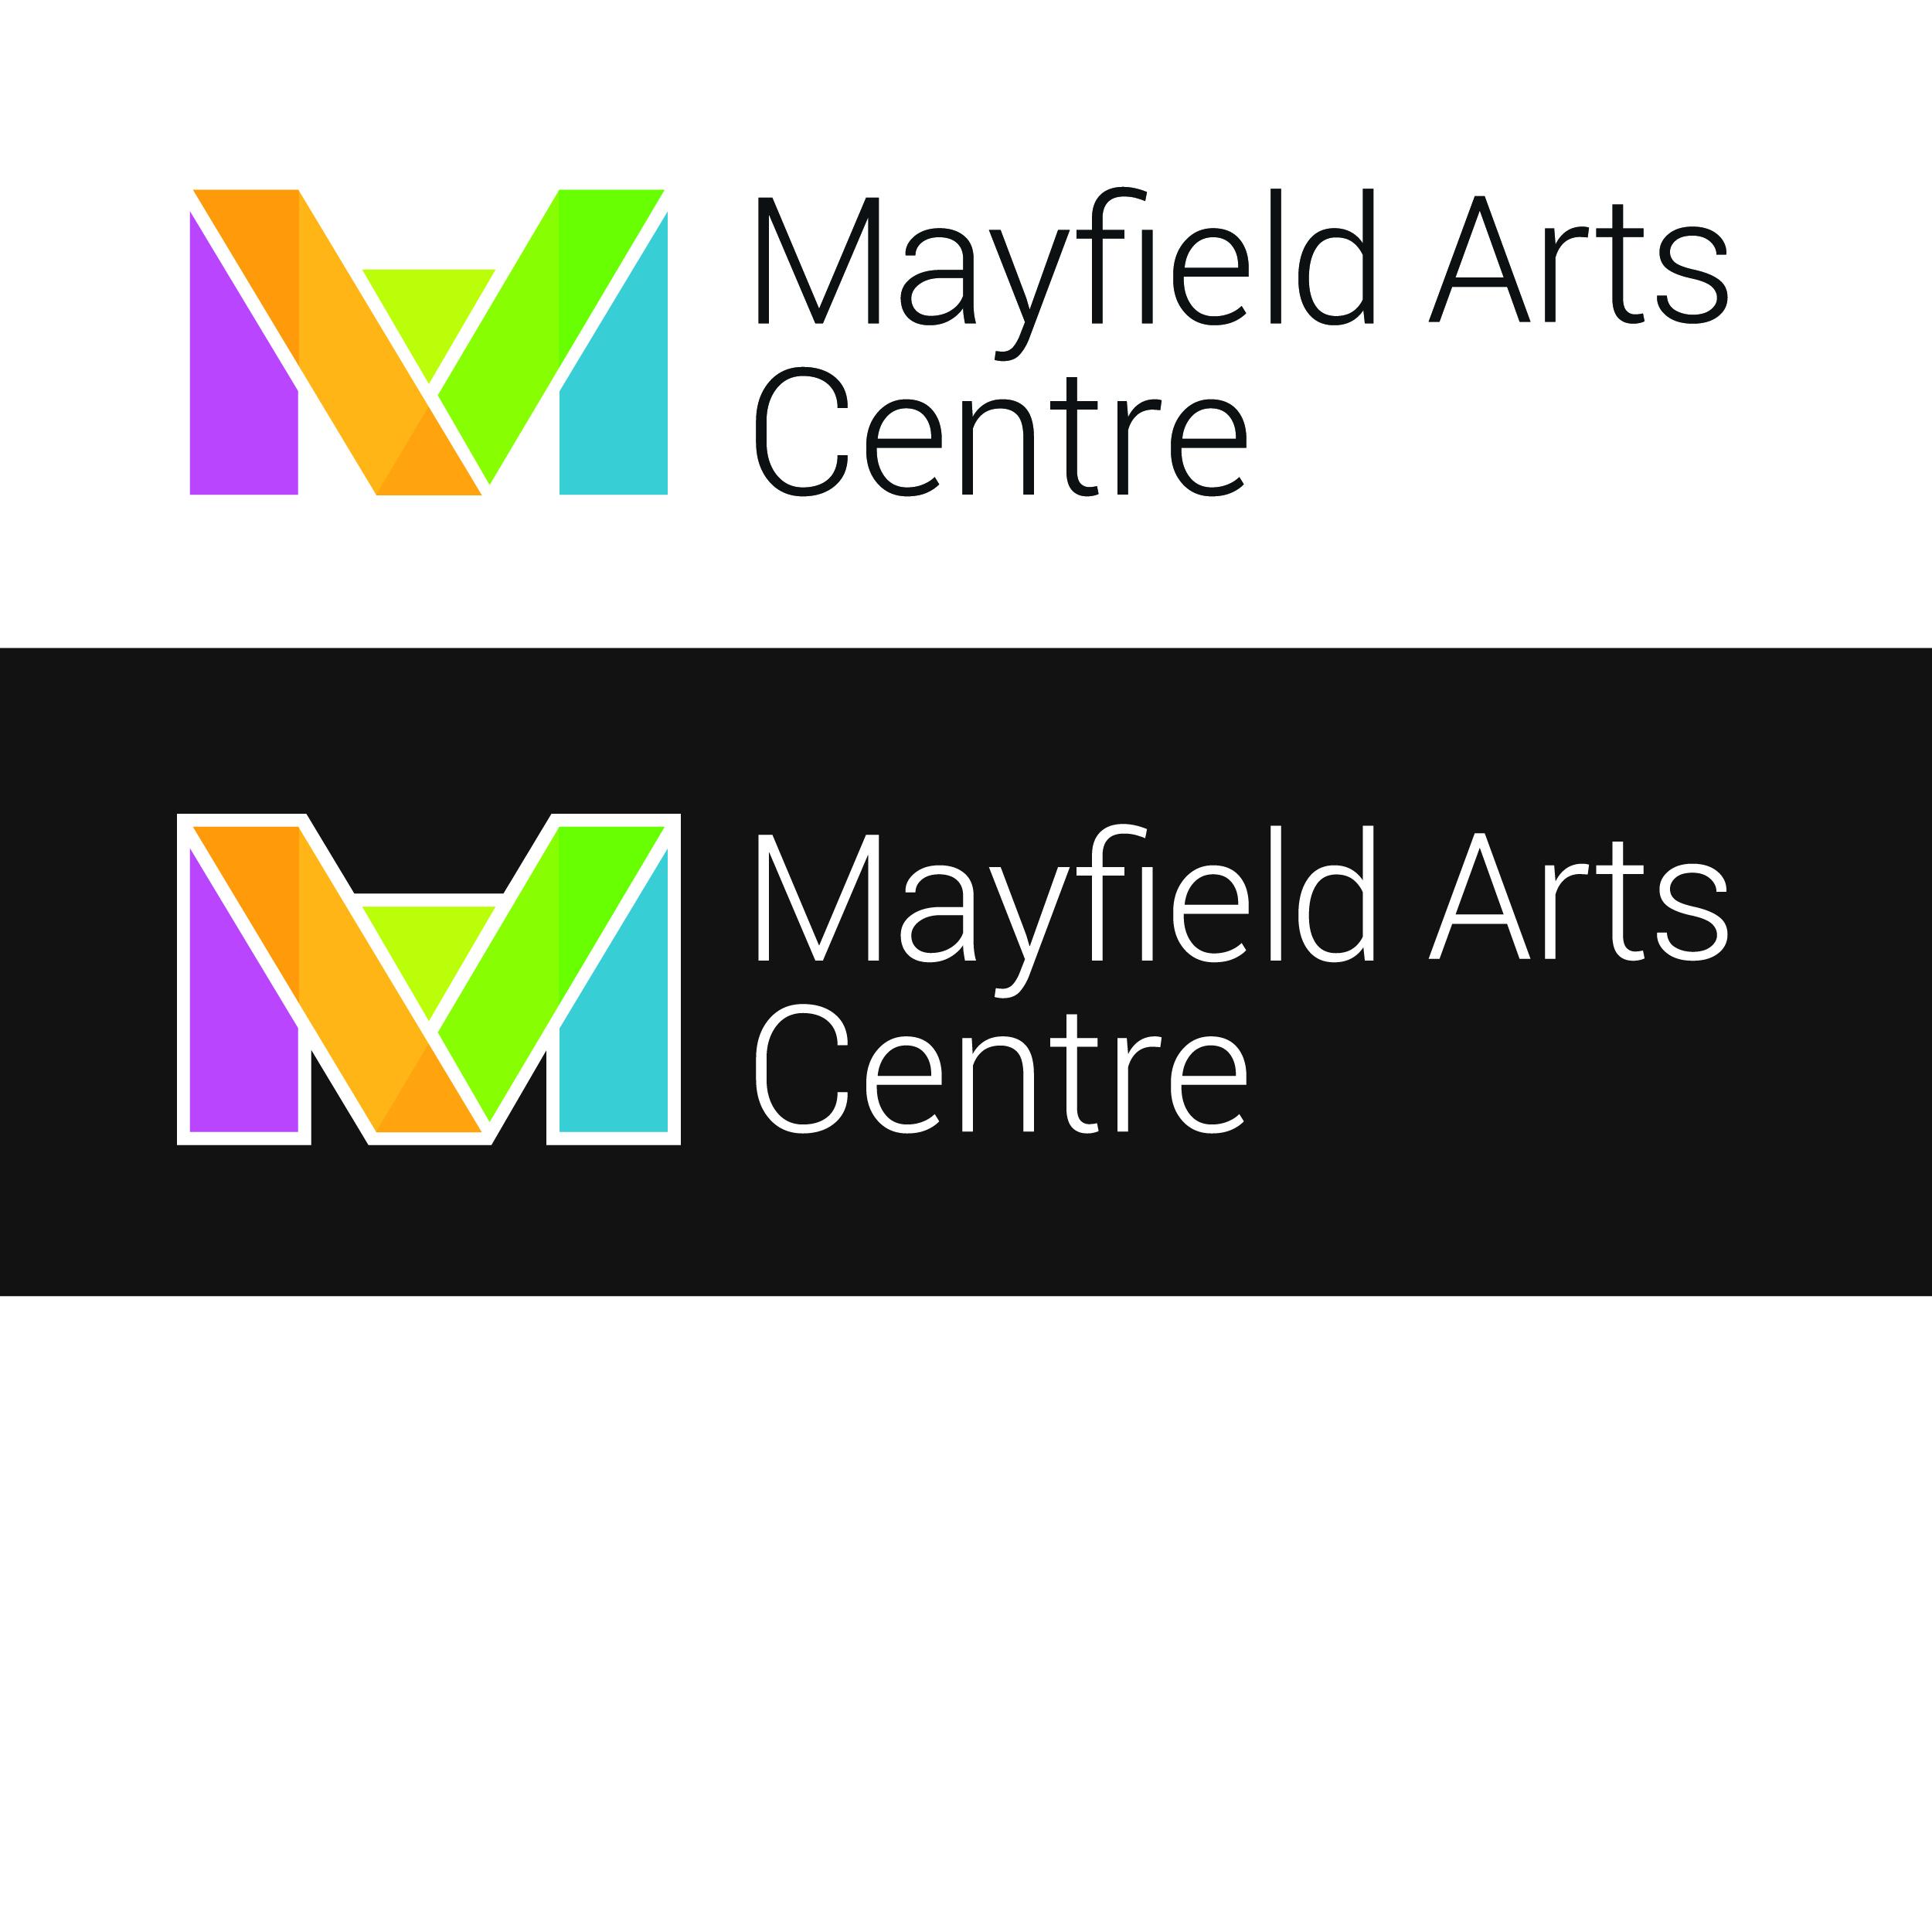 mayfield_.jpg